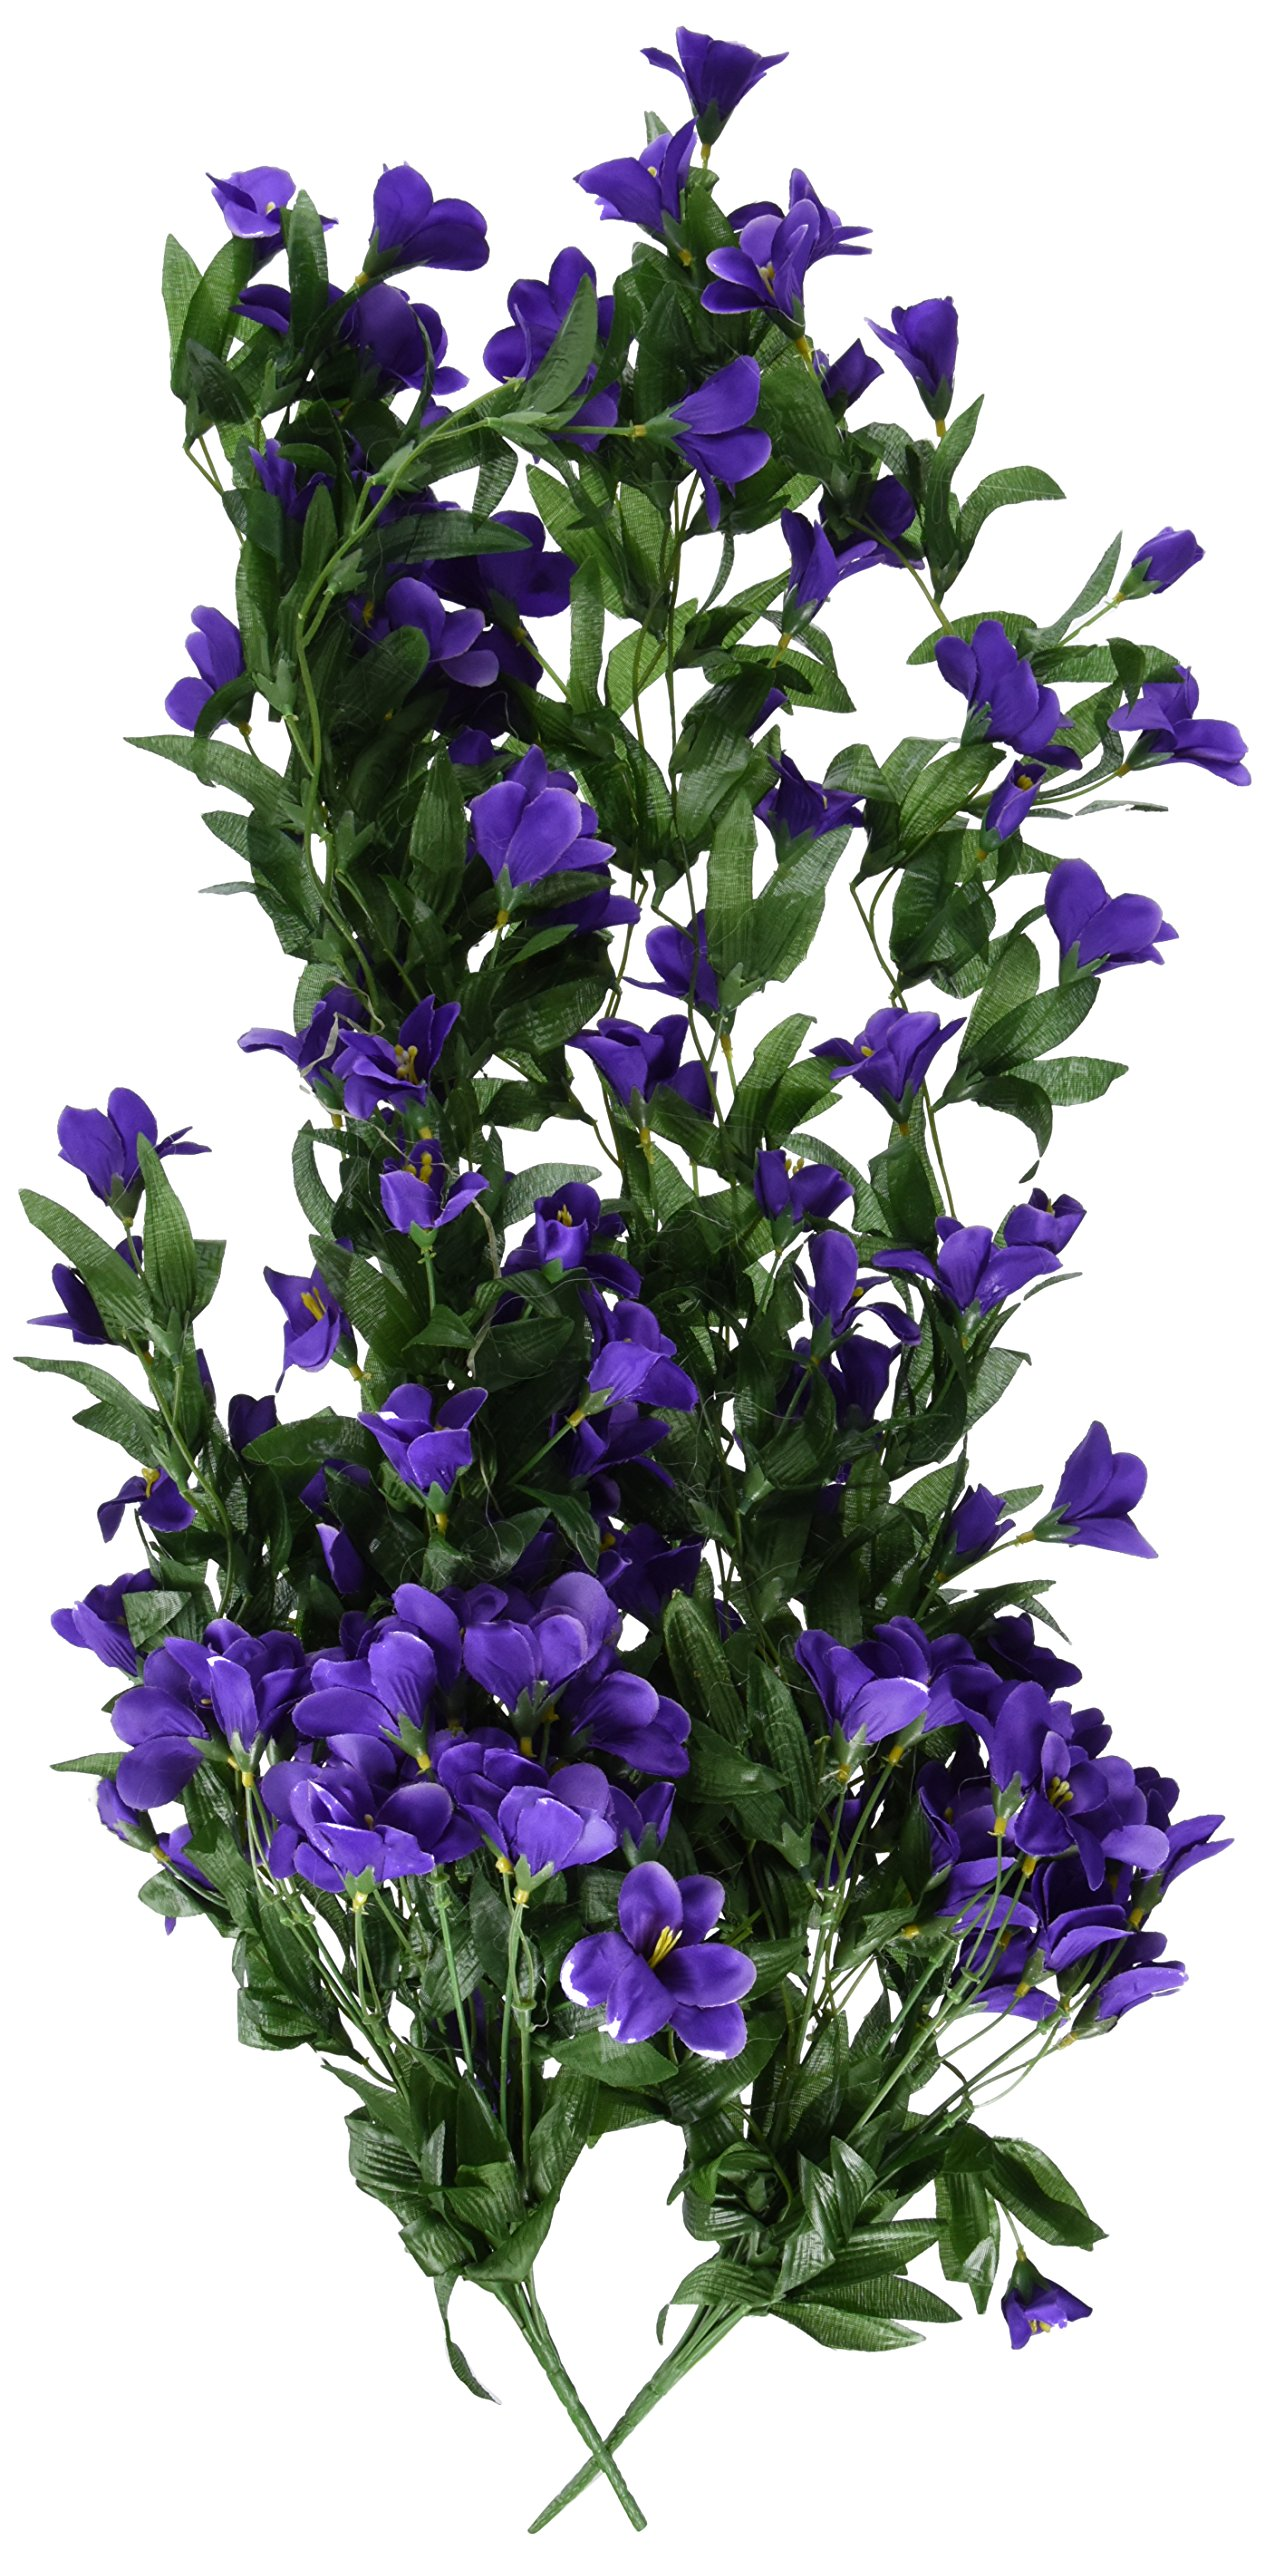 12-pcslot-Lovely-Light-Purple-Mini-Hydrangea-Artificial-Fake-plastic-Mini-Fresh-Silk-Flower-Arrangement-Home-Home-Decorative-Flowers-Bouquet-Dining-table-Hotel-party-Wedding-DIY-Craft-fake-flores-marr